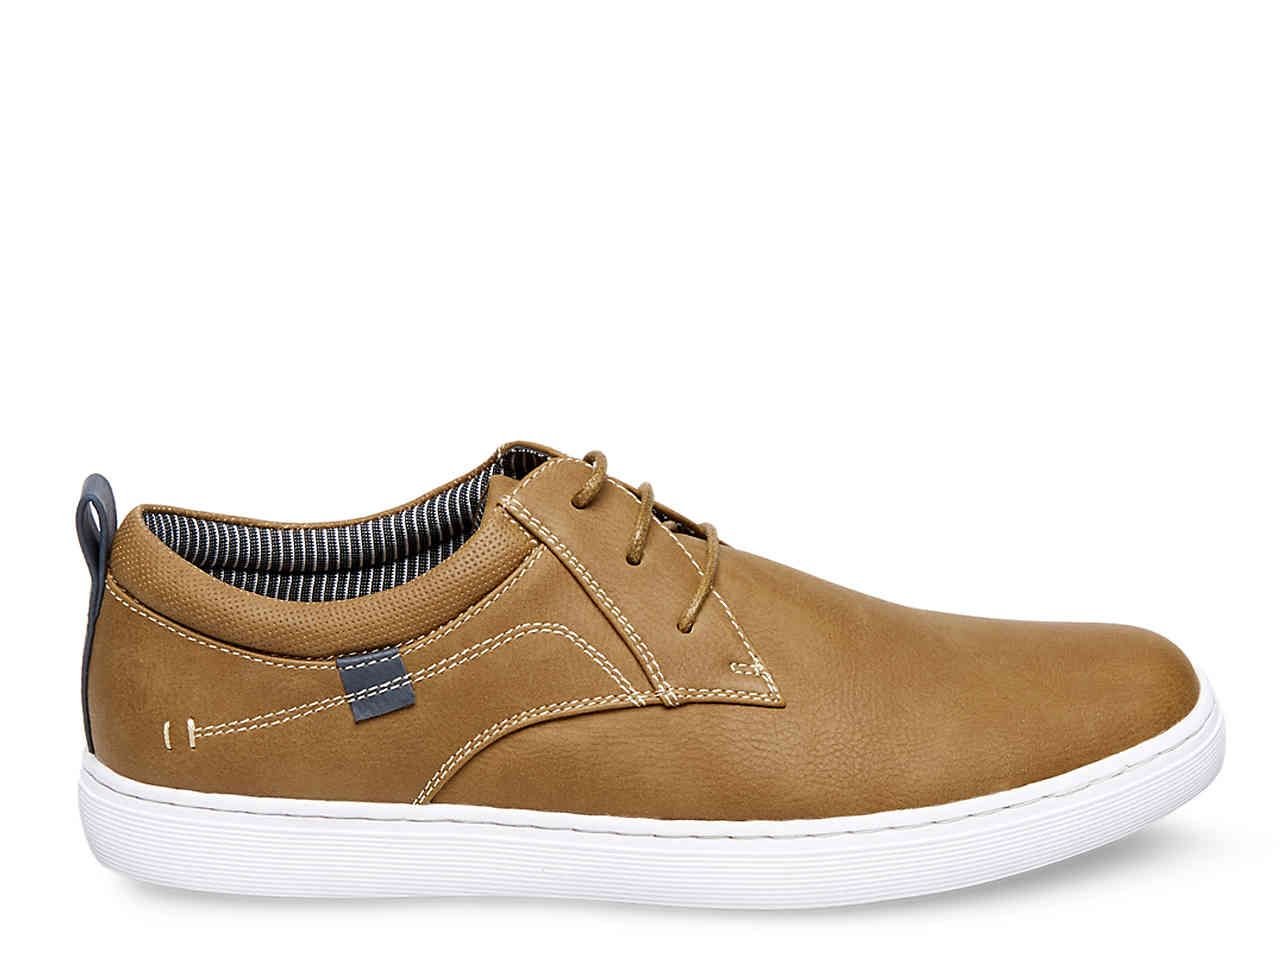 Steve Madden Instax Sneaker | Mens